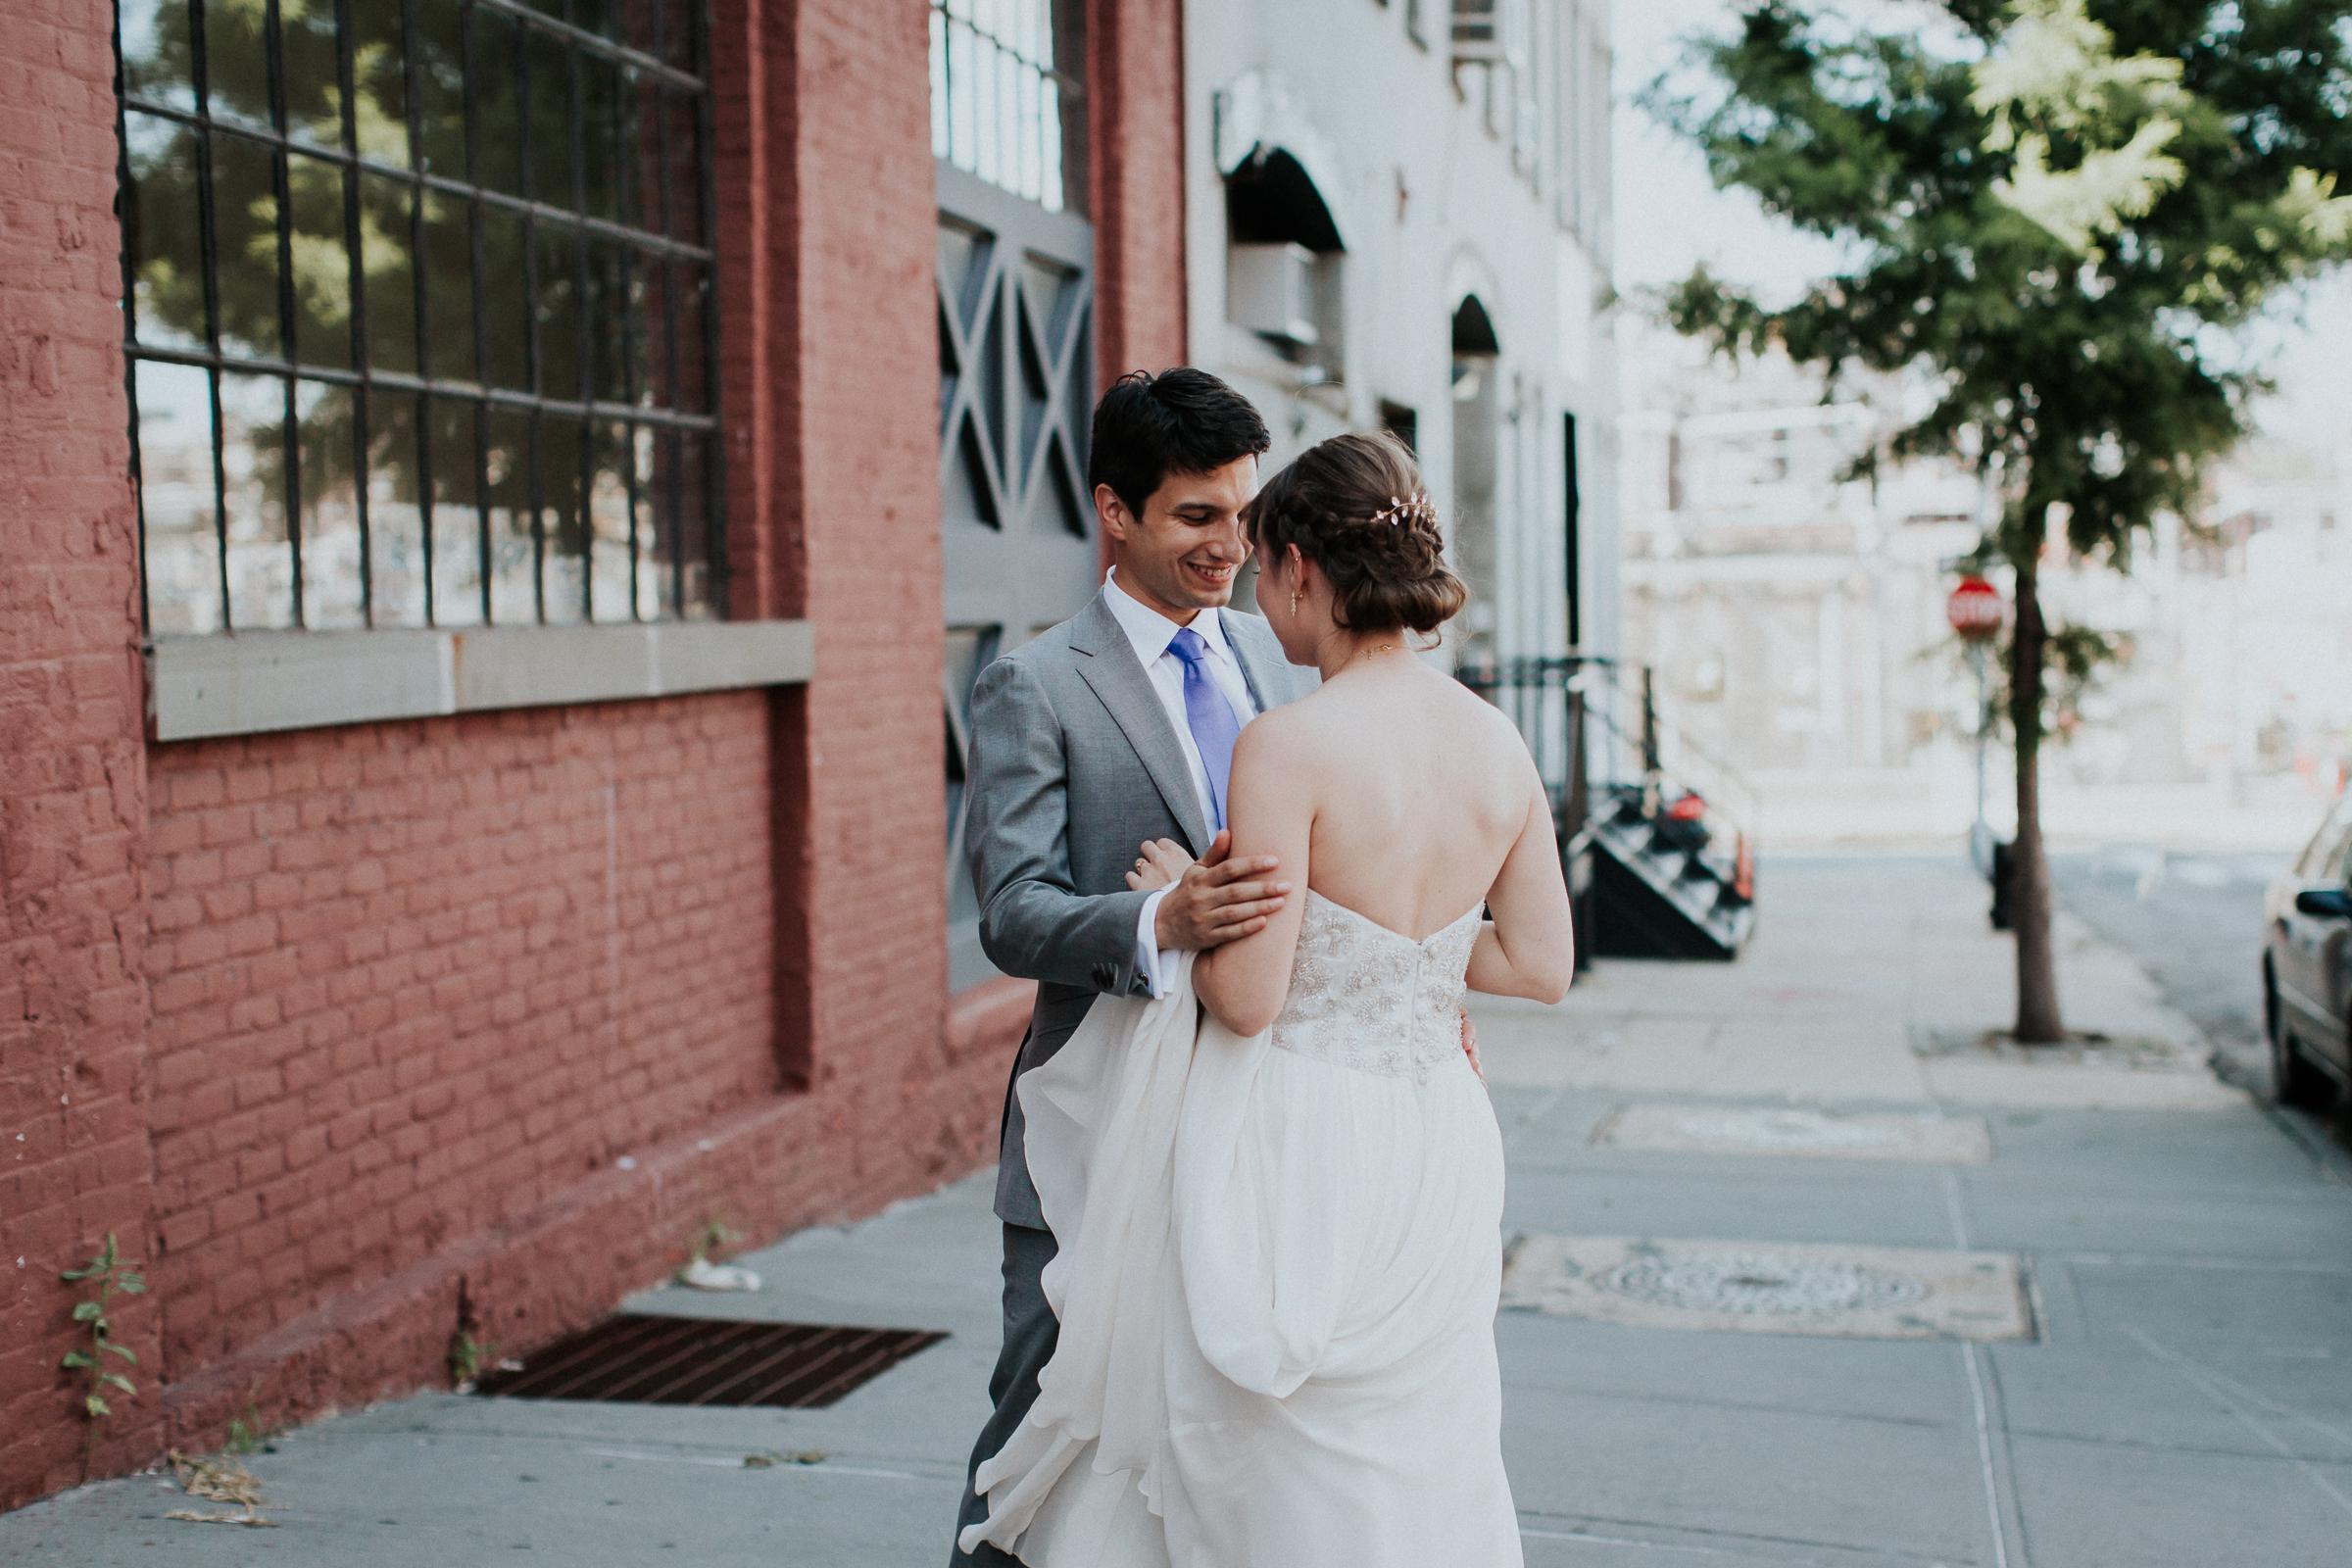 Dinosaur-Inspired-Brooklyn-Wedding-26-Bridge-New-York-Documentary-Wedding-Photographer-14.jpg